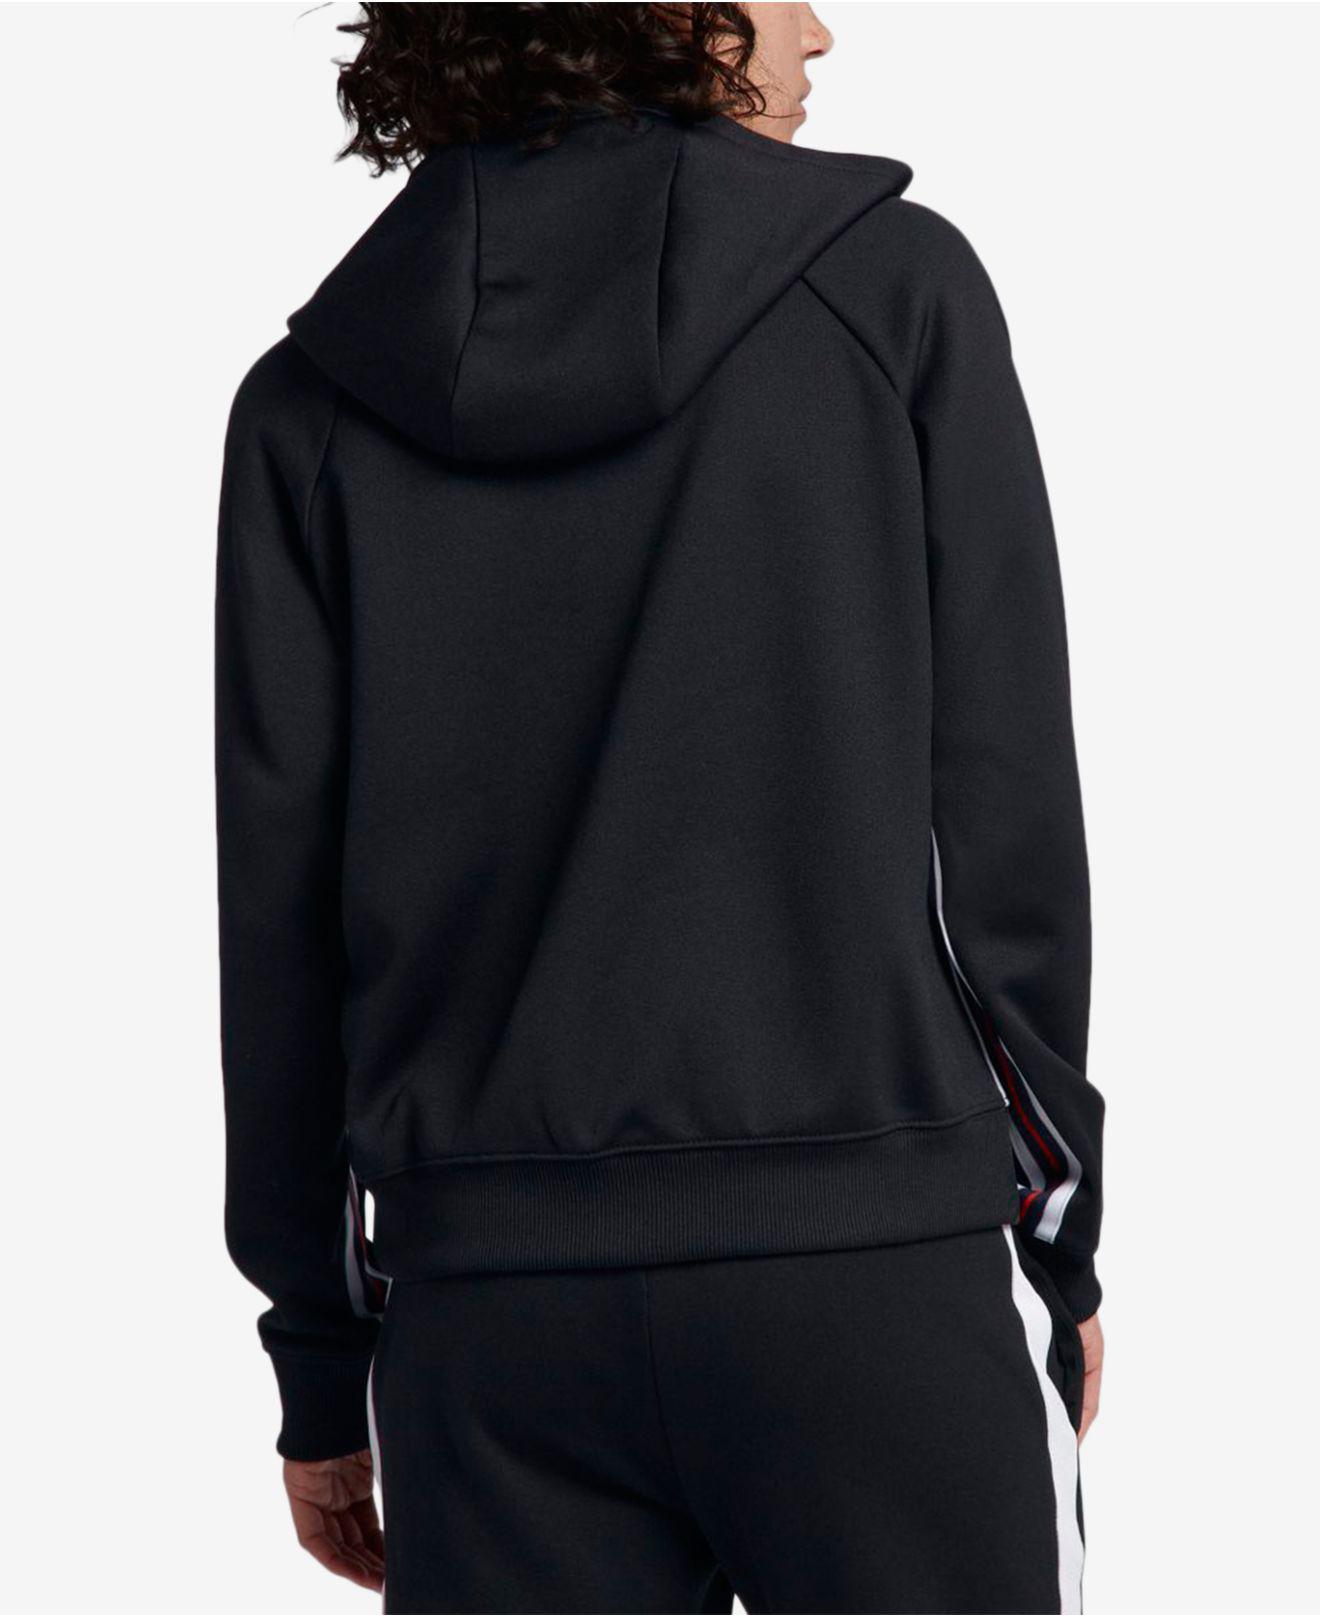 5cf258e3bc50 Lyst - Nike Sportswear Zip Hoodie in Black